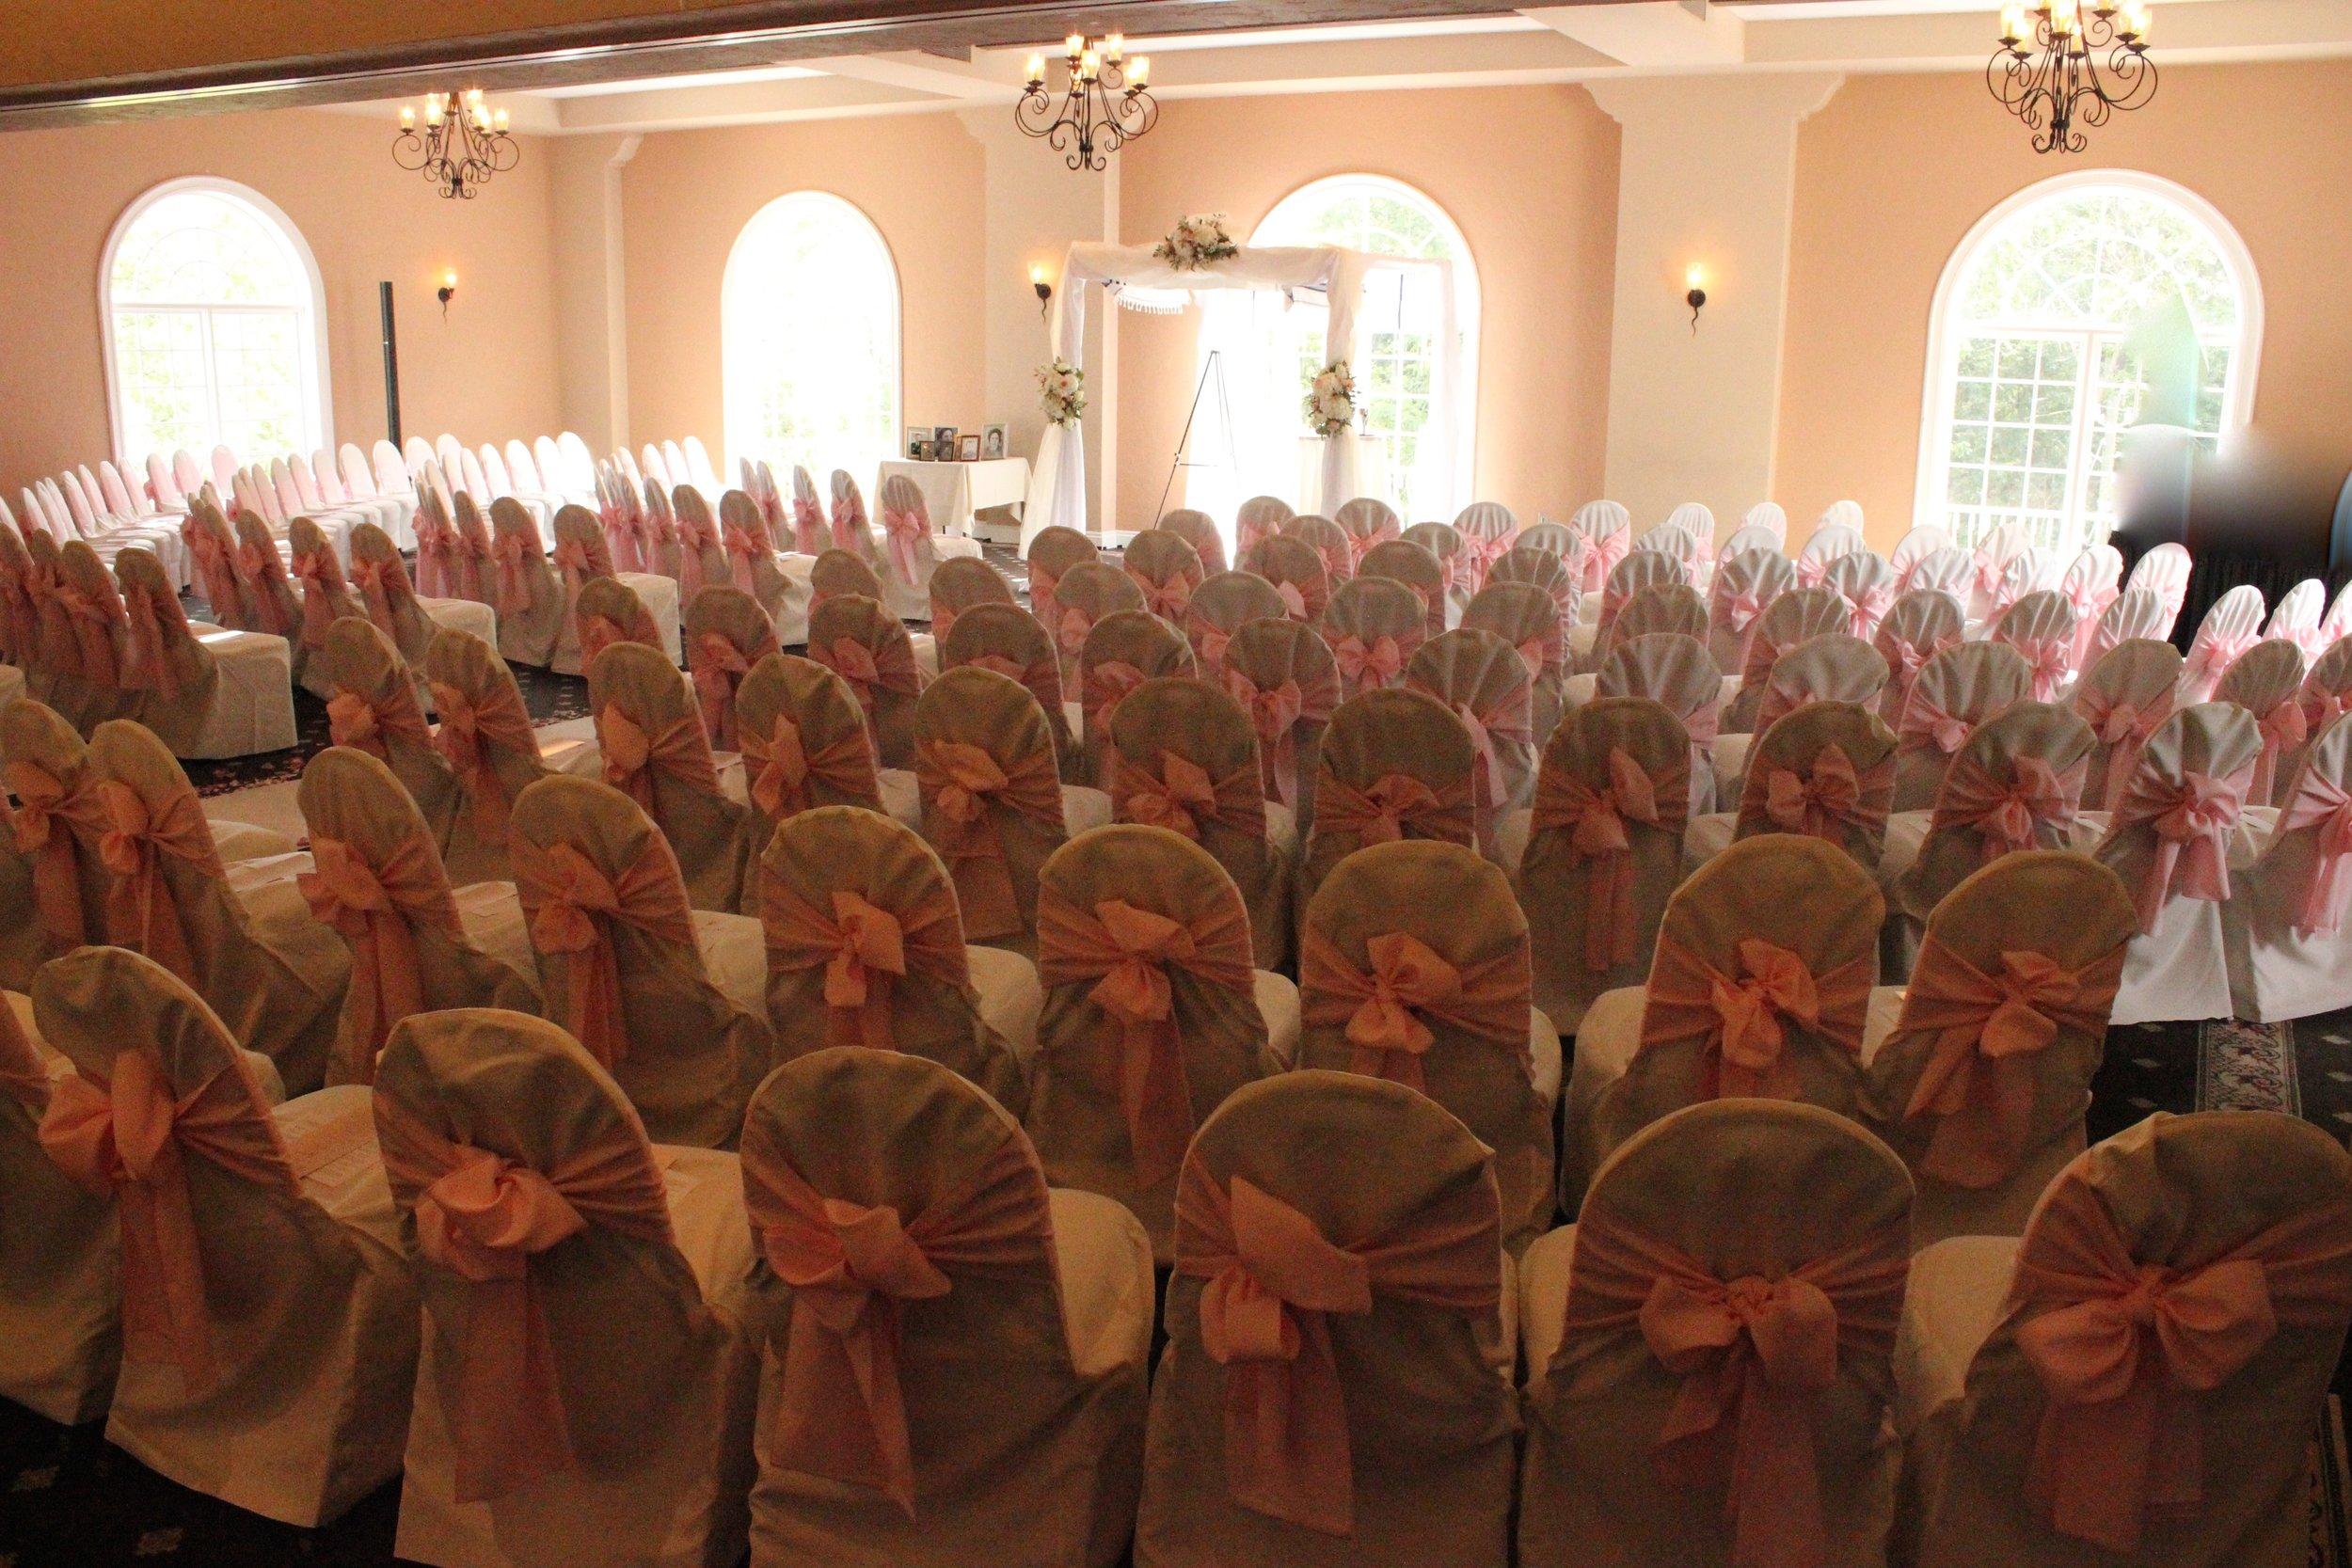 Chuppah and Hillcrest Country Club ballroom ready